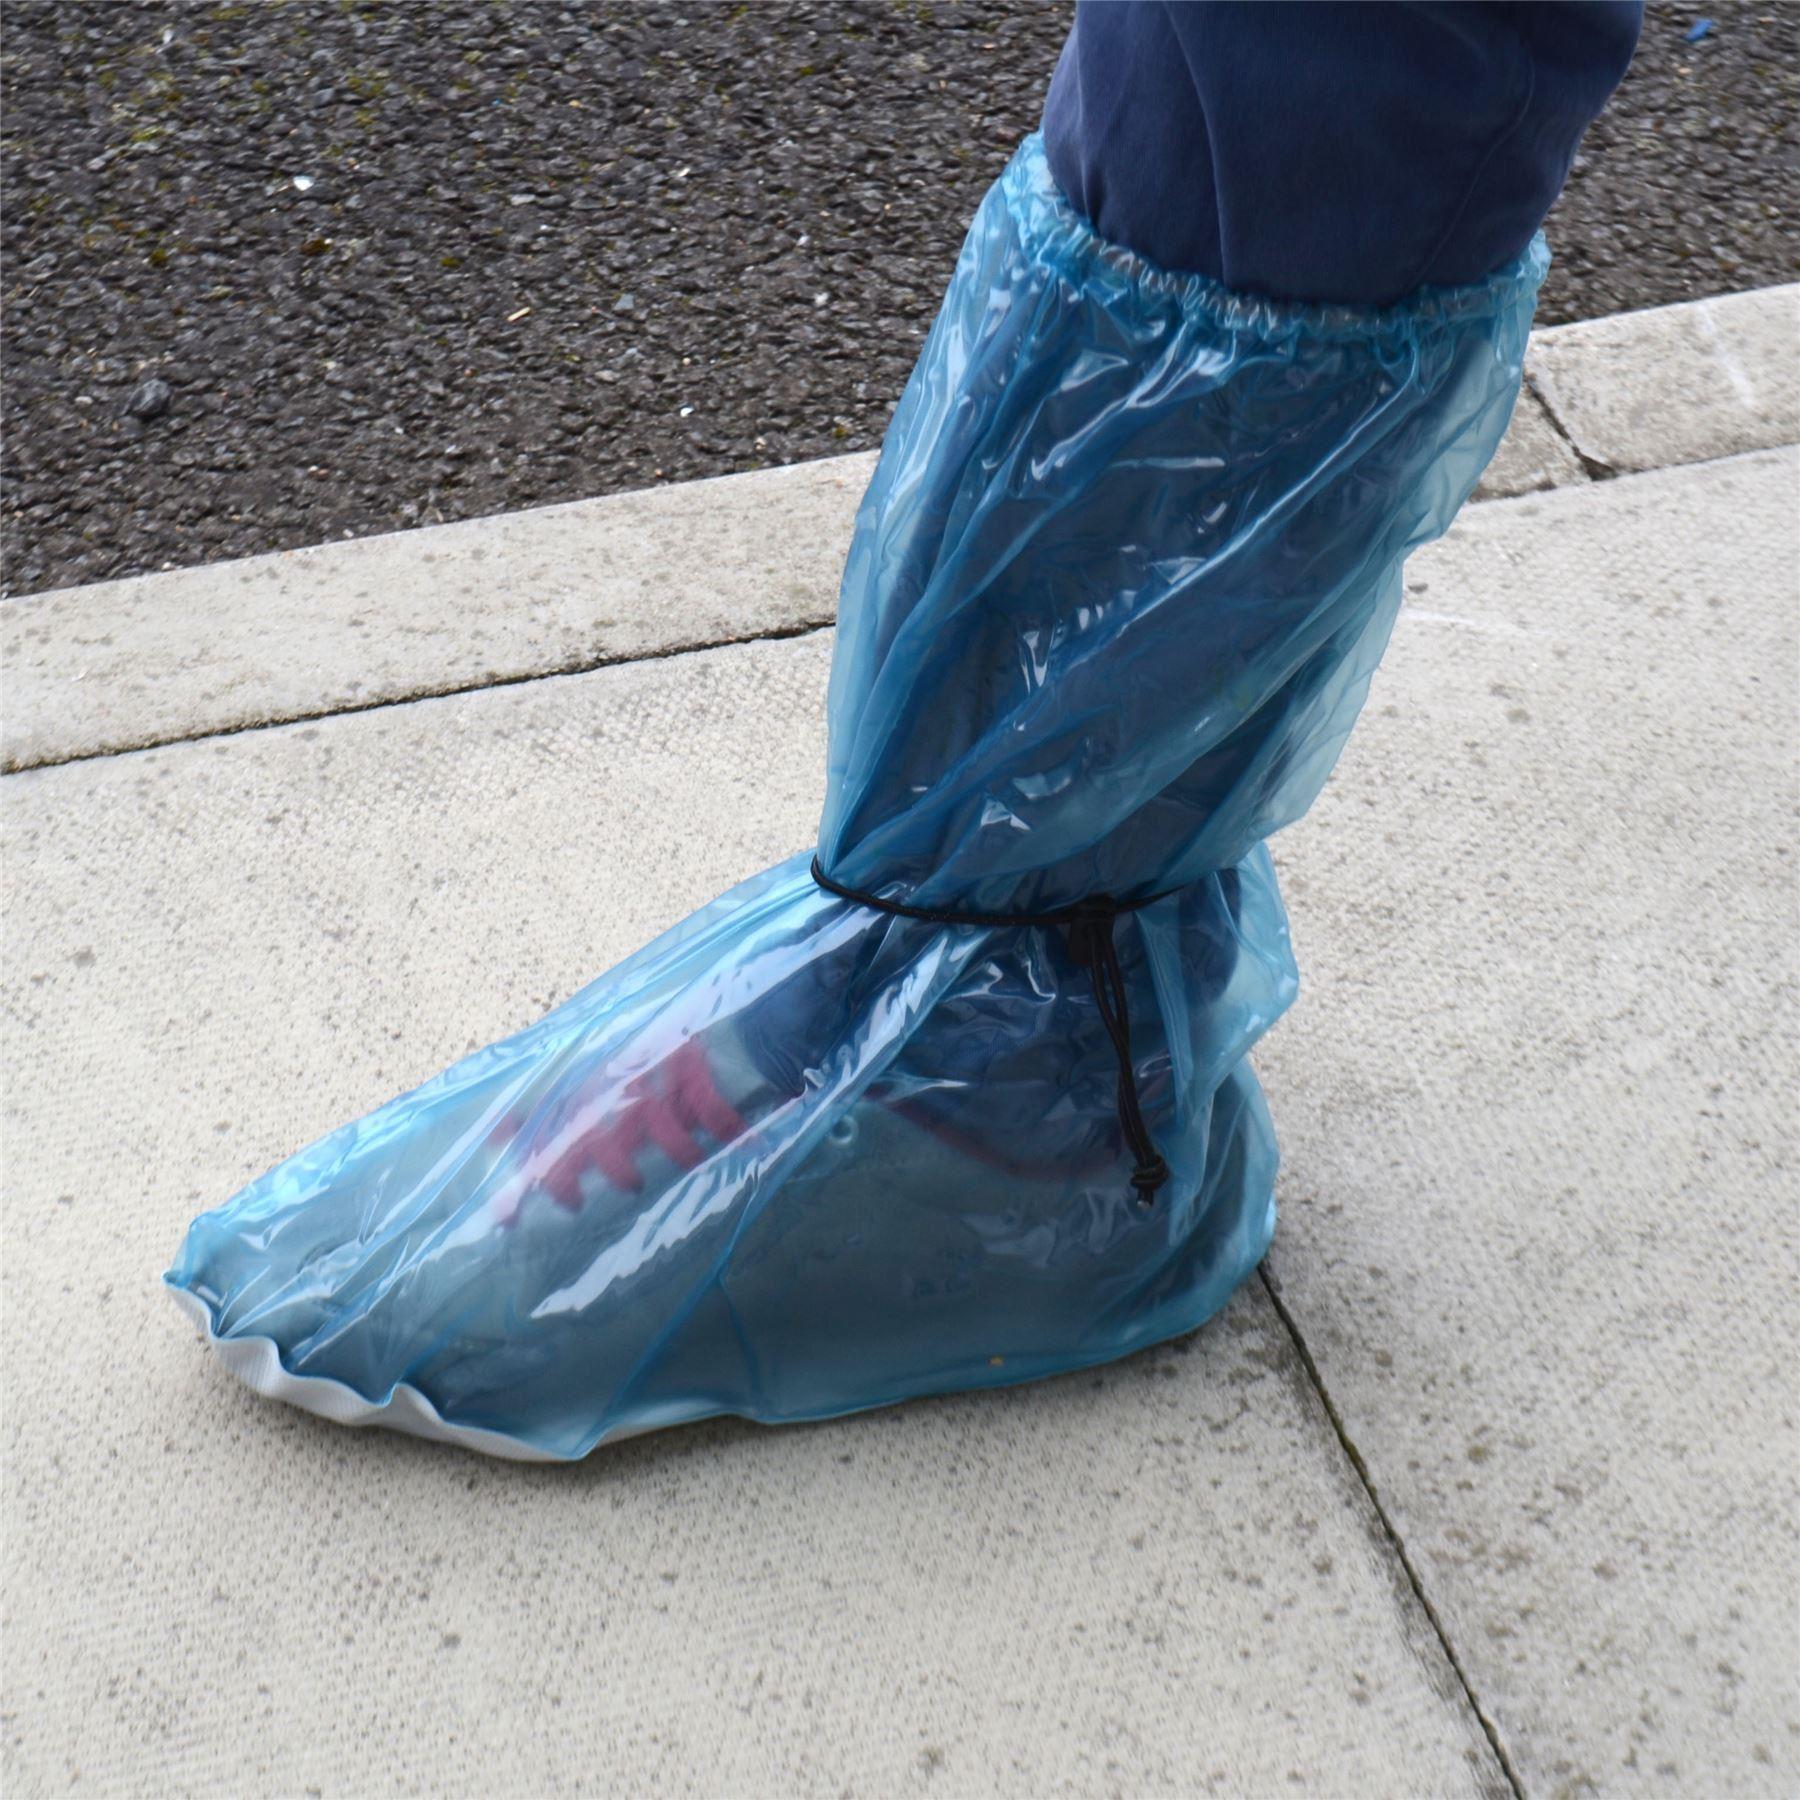 waterproof non slip shoe boot covers festival outdoor